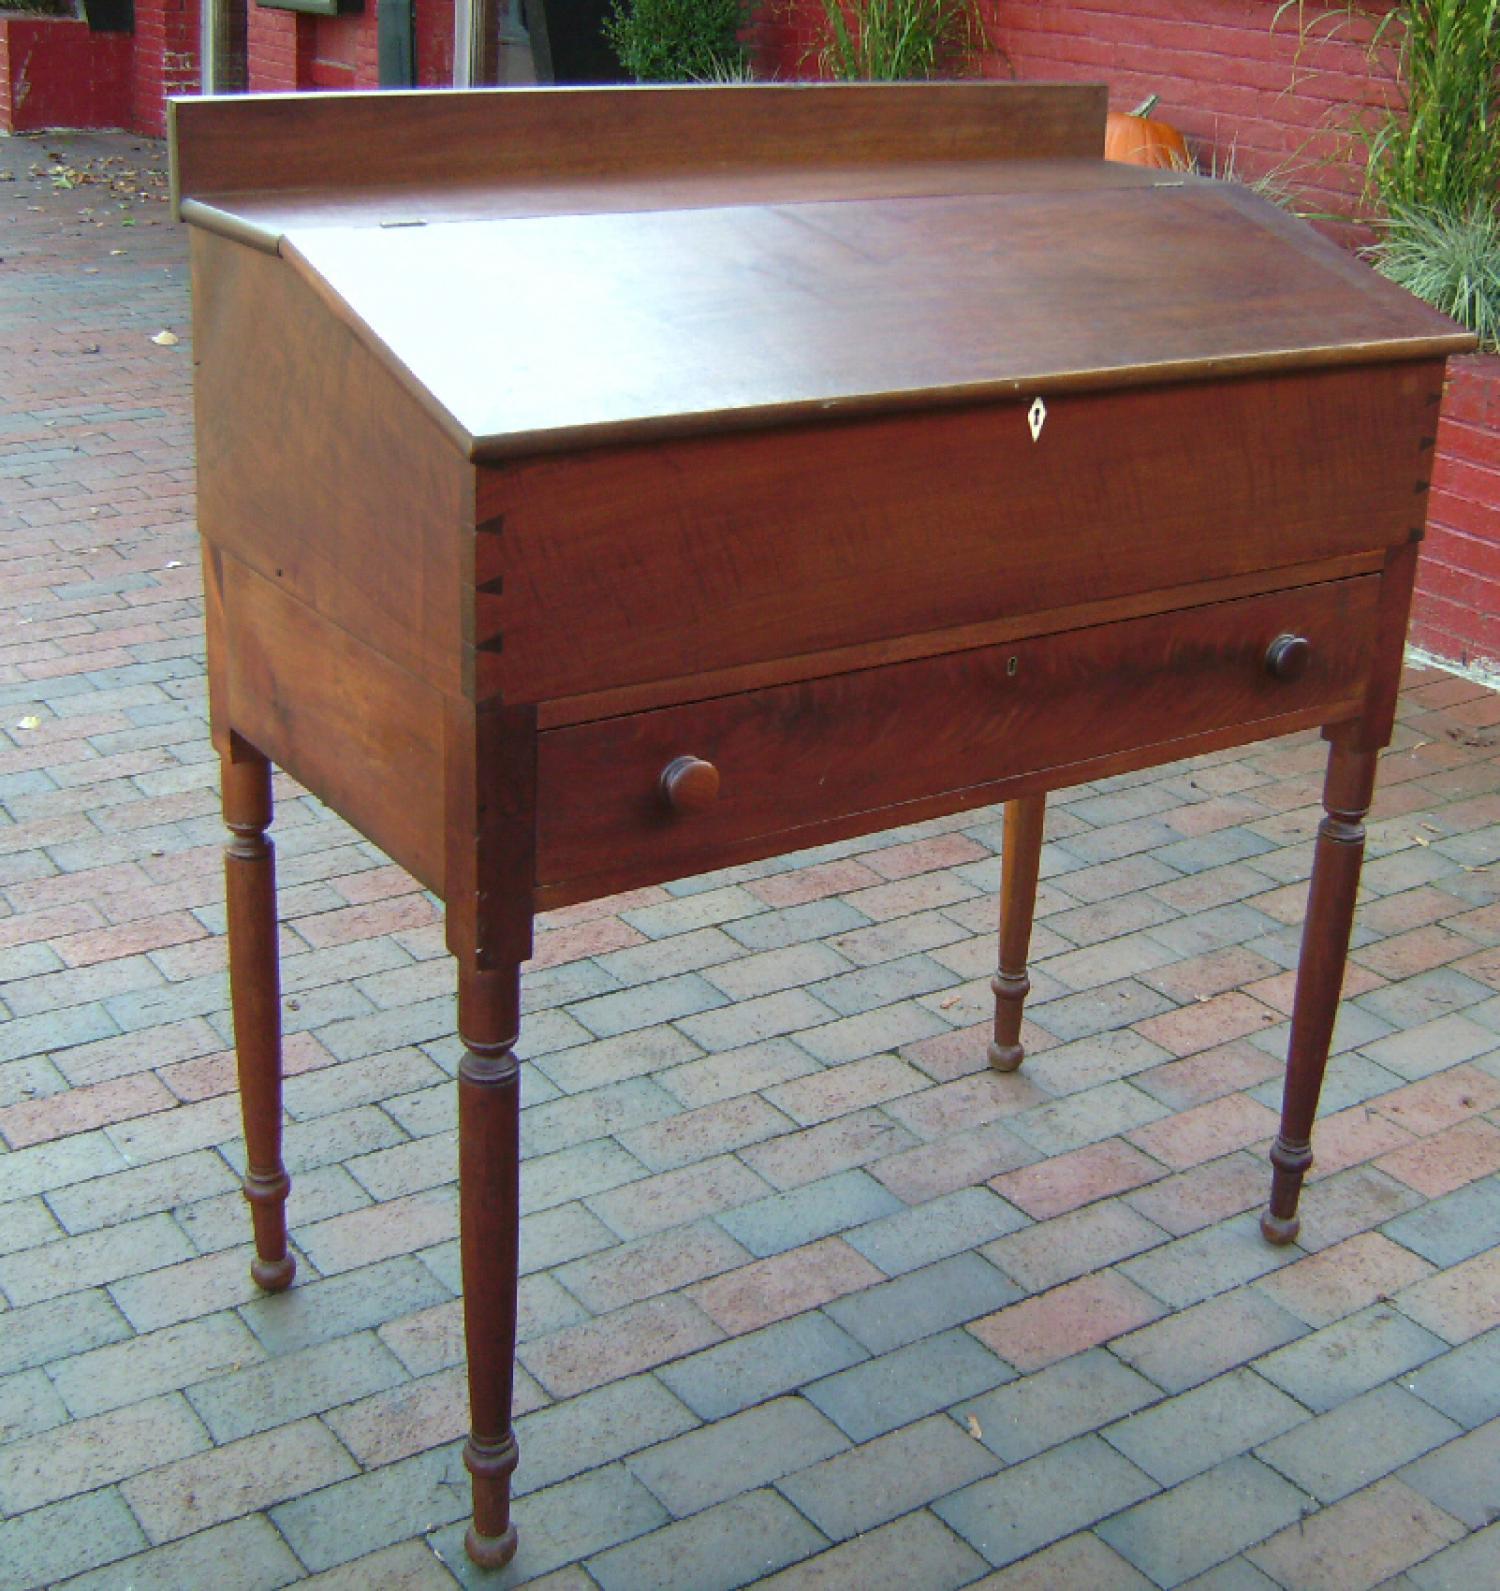 Penn country  walnut slant lid plantation desk c1840